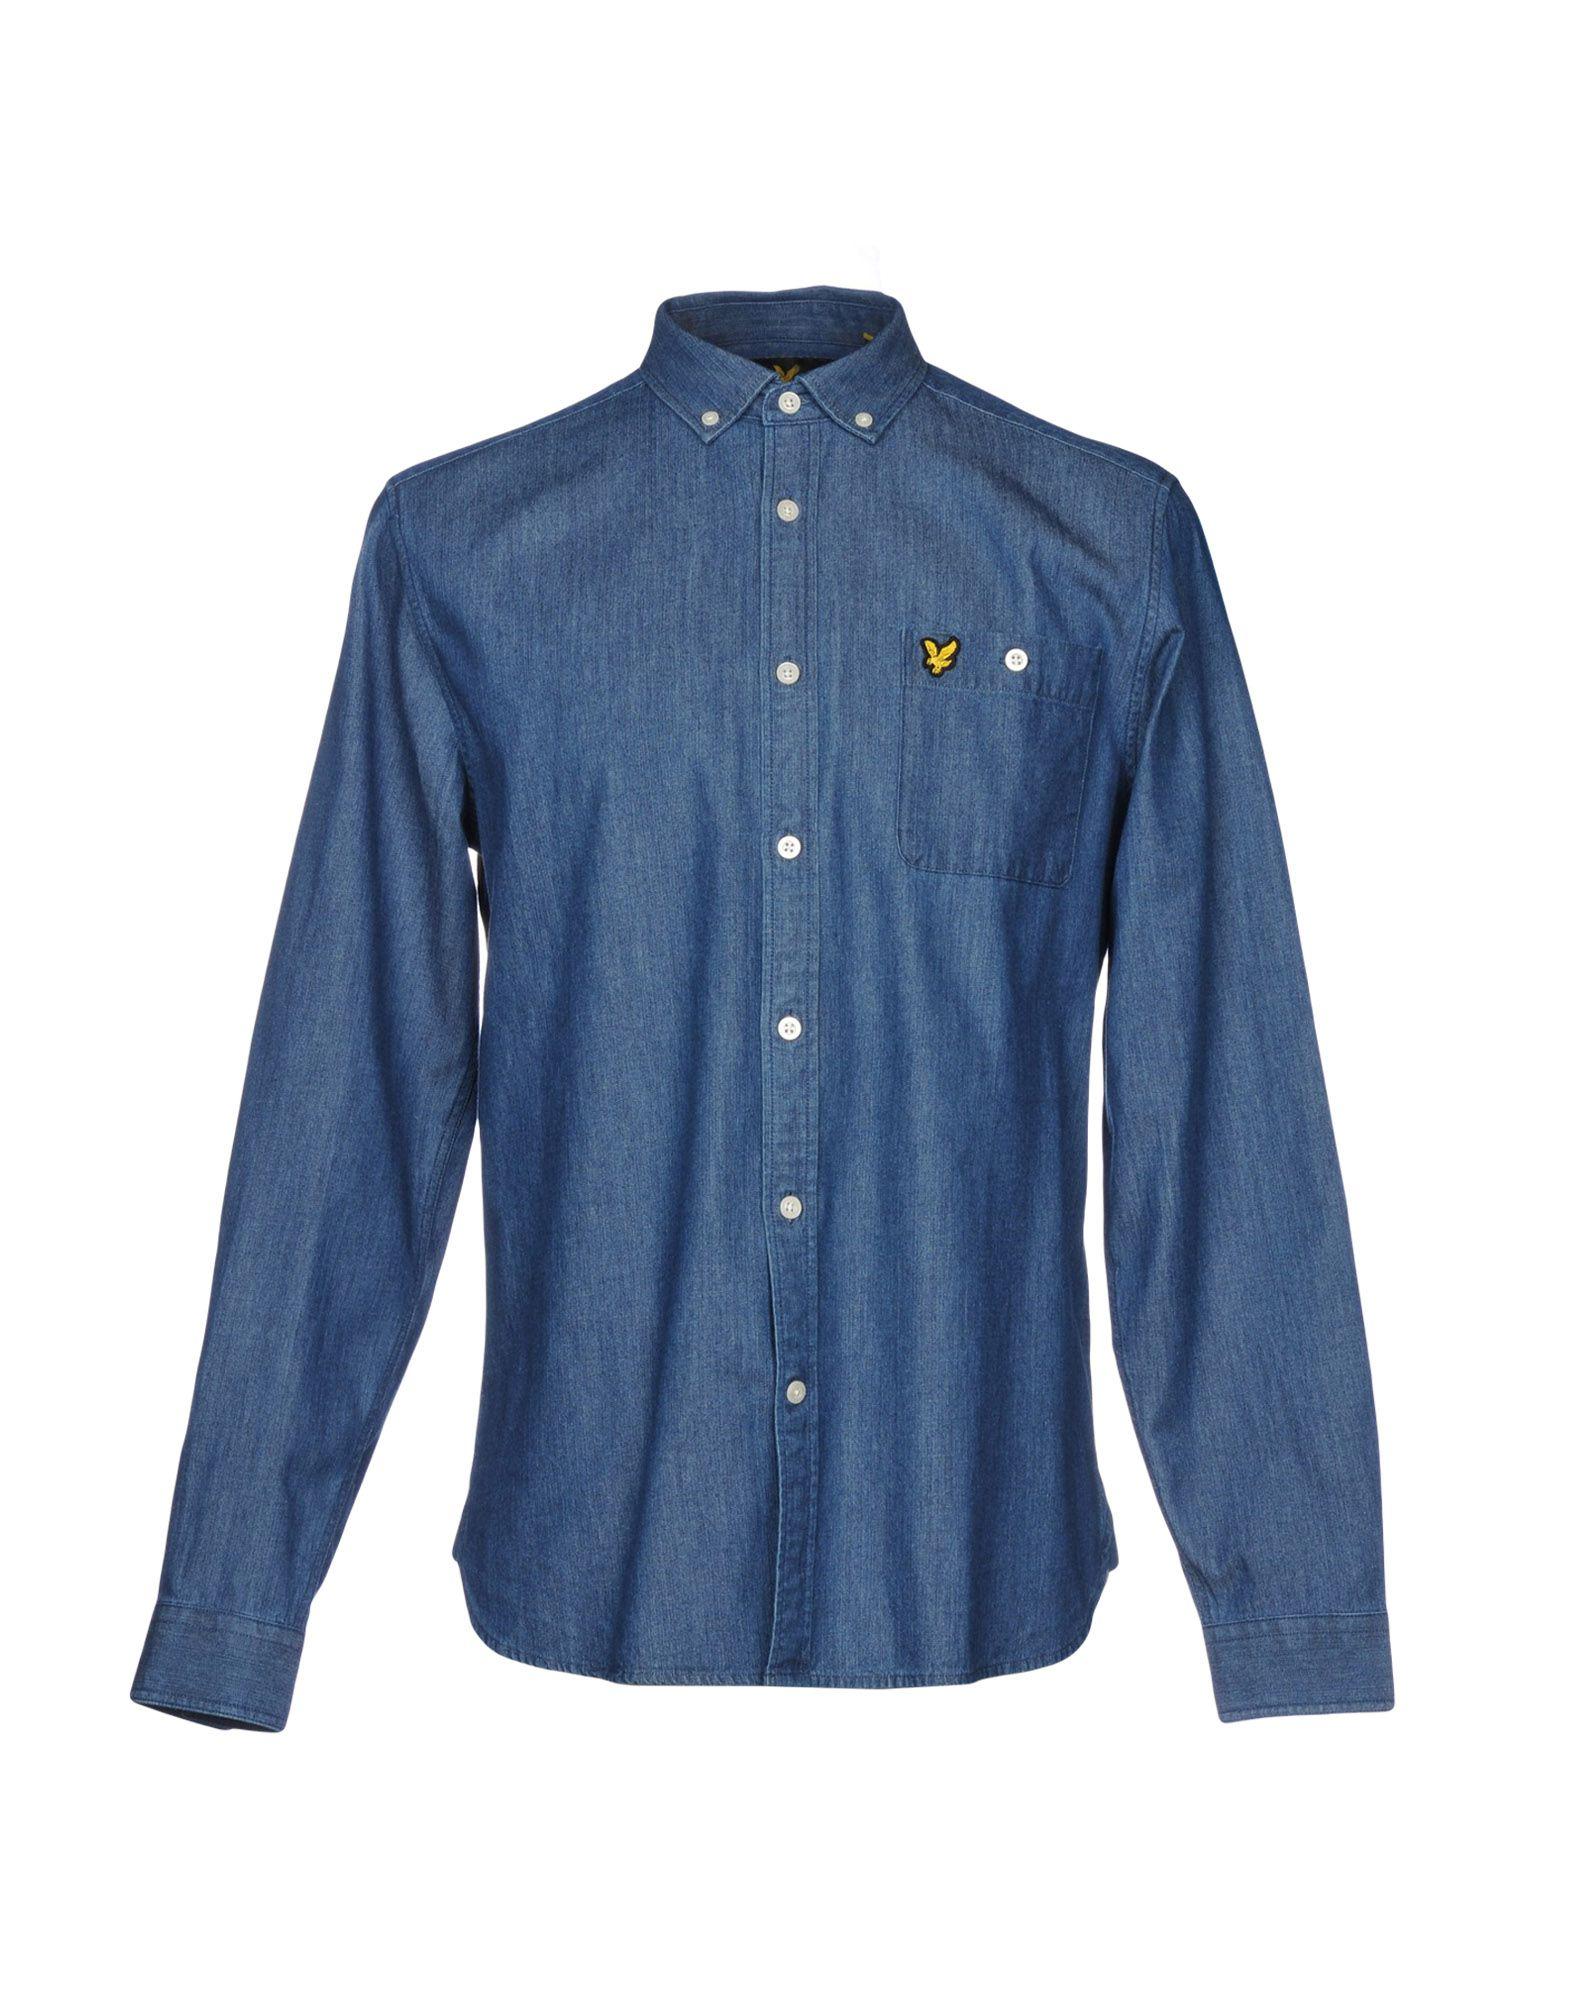 LYLE & SCOTT Джинсовая рубашка